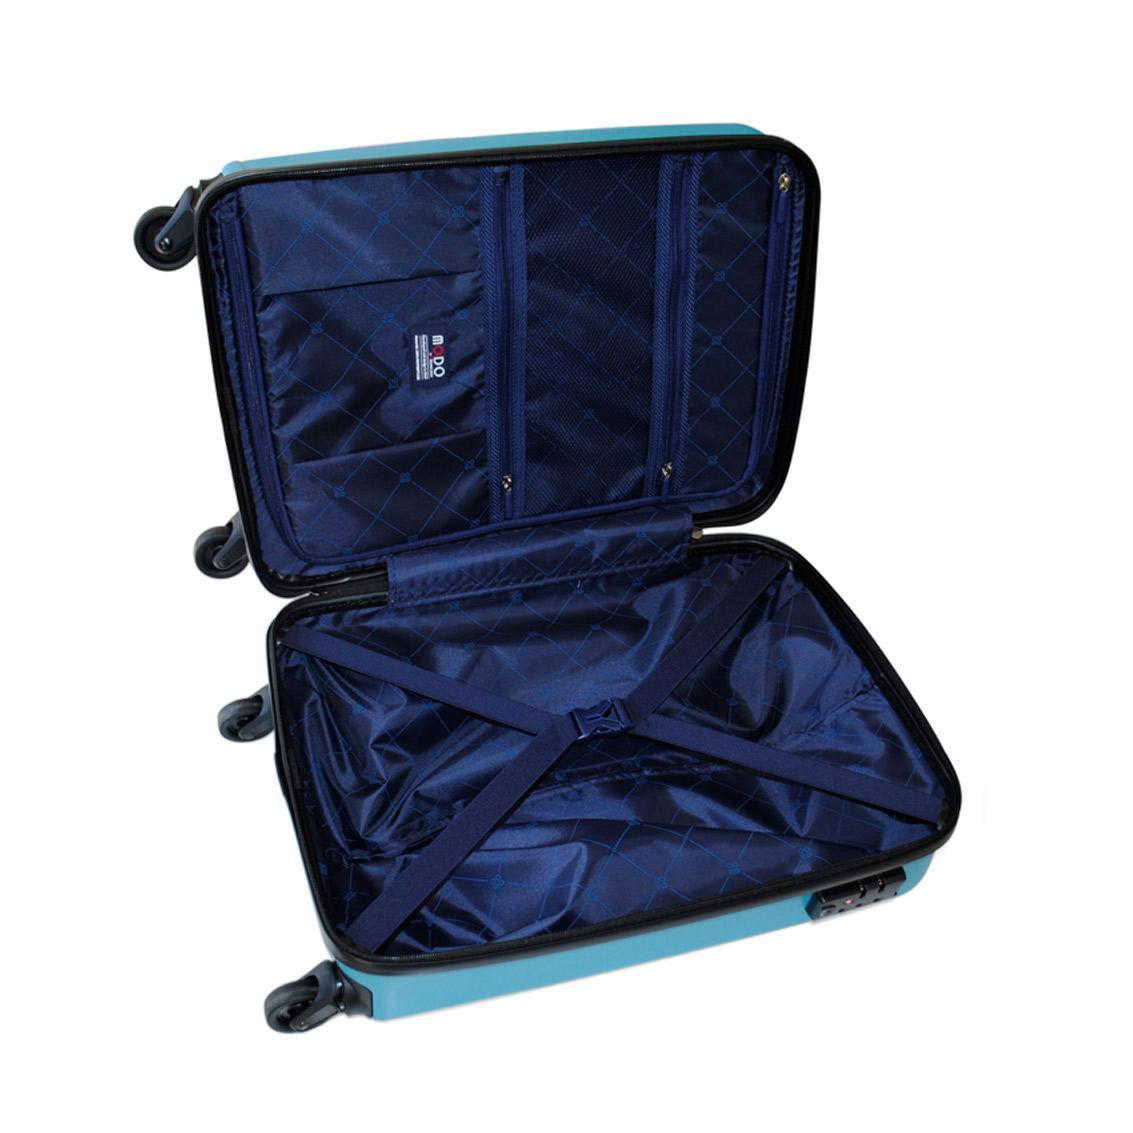 Large Luggage  ACQUA BLUE Modo by Roncato